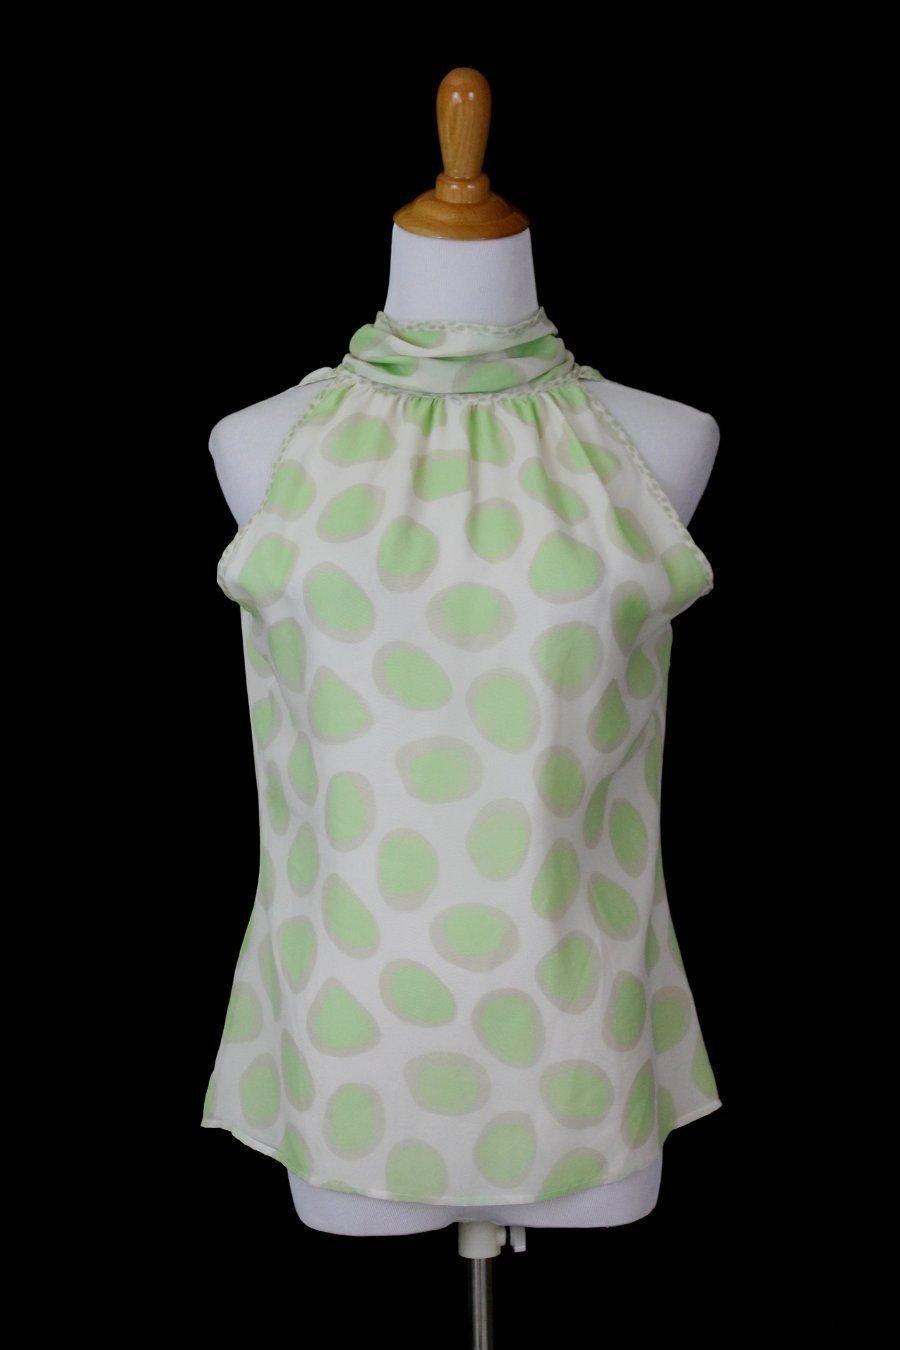 Louis Feraud Pussy Bow Silk Halter Blouse Shell Pastel Green Polka Dots 8 38 M